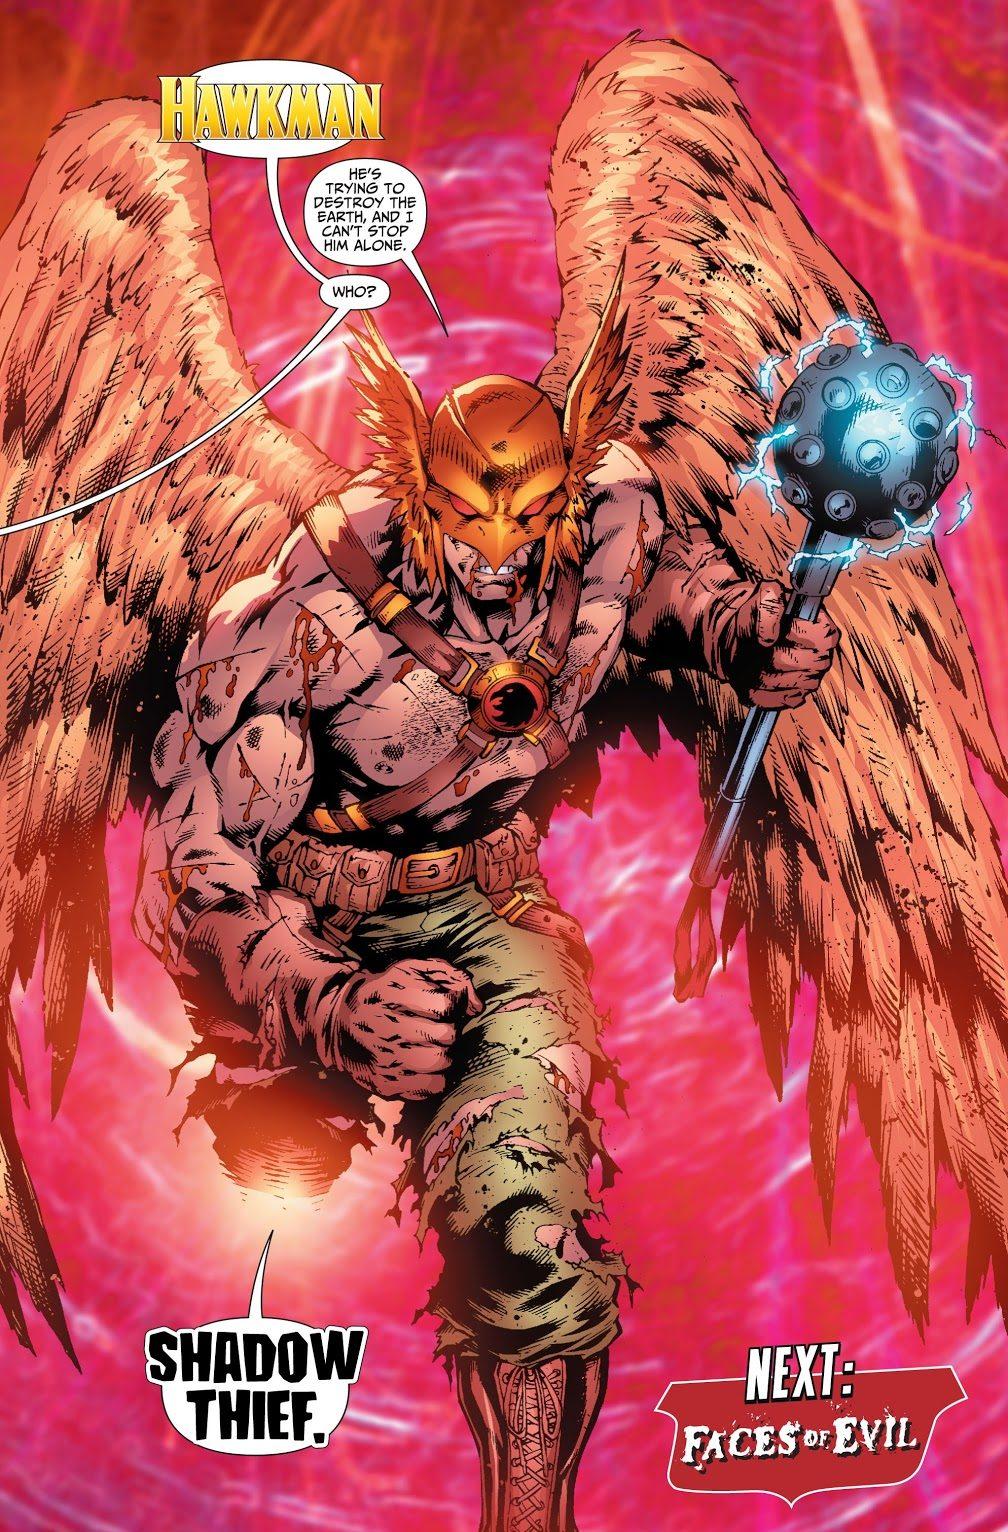 Hawkman (Justice League of America Vol. 2 #28)